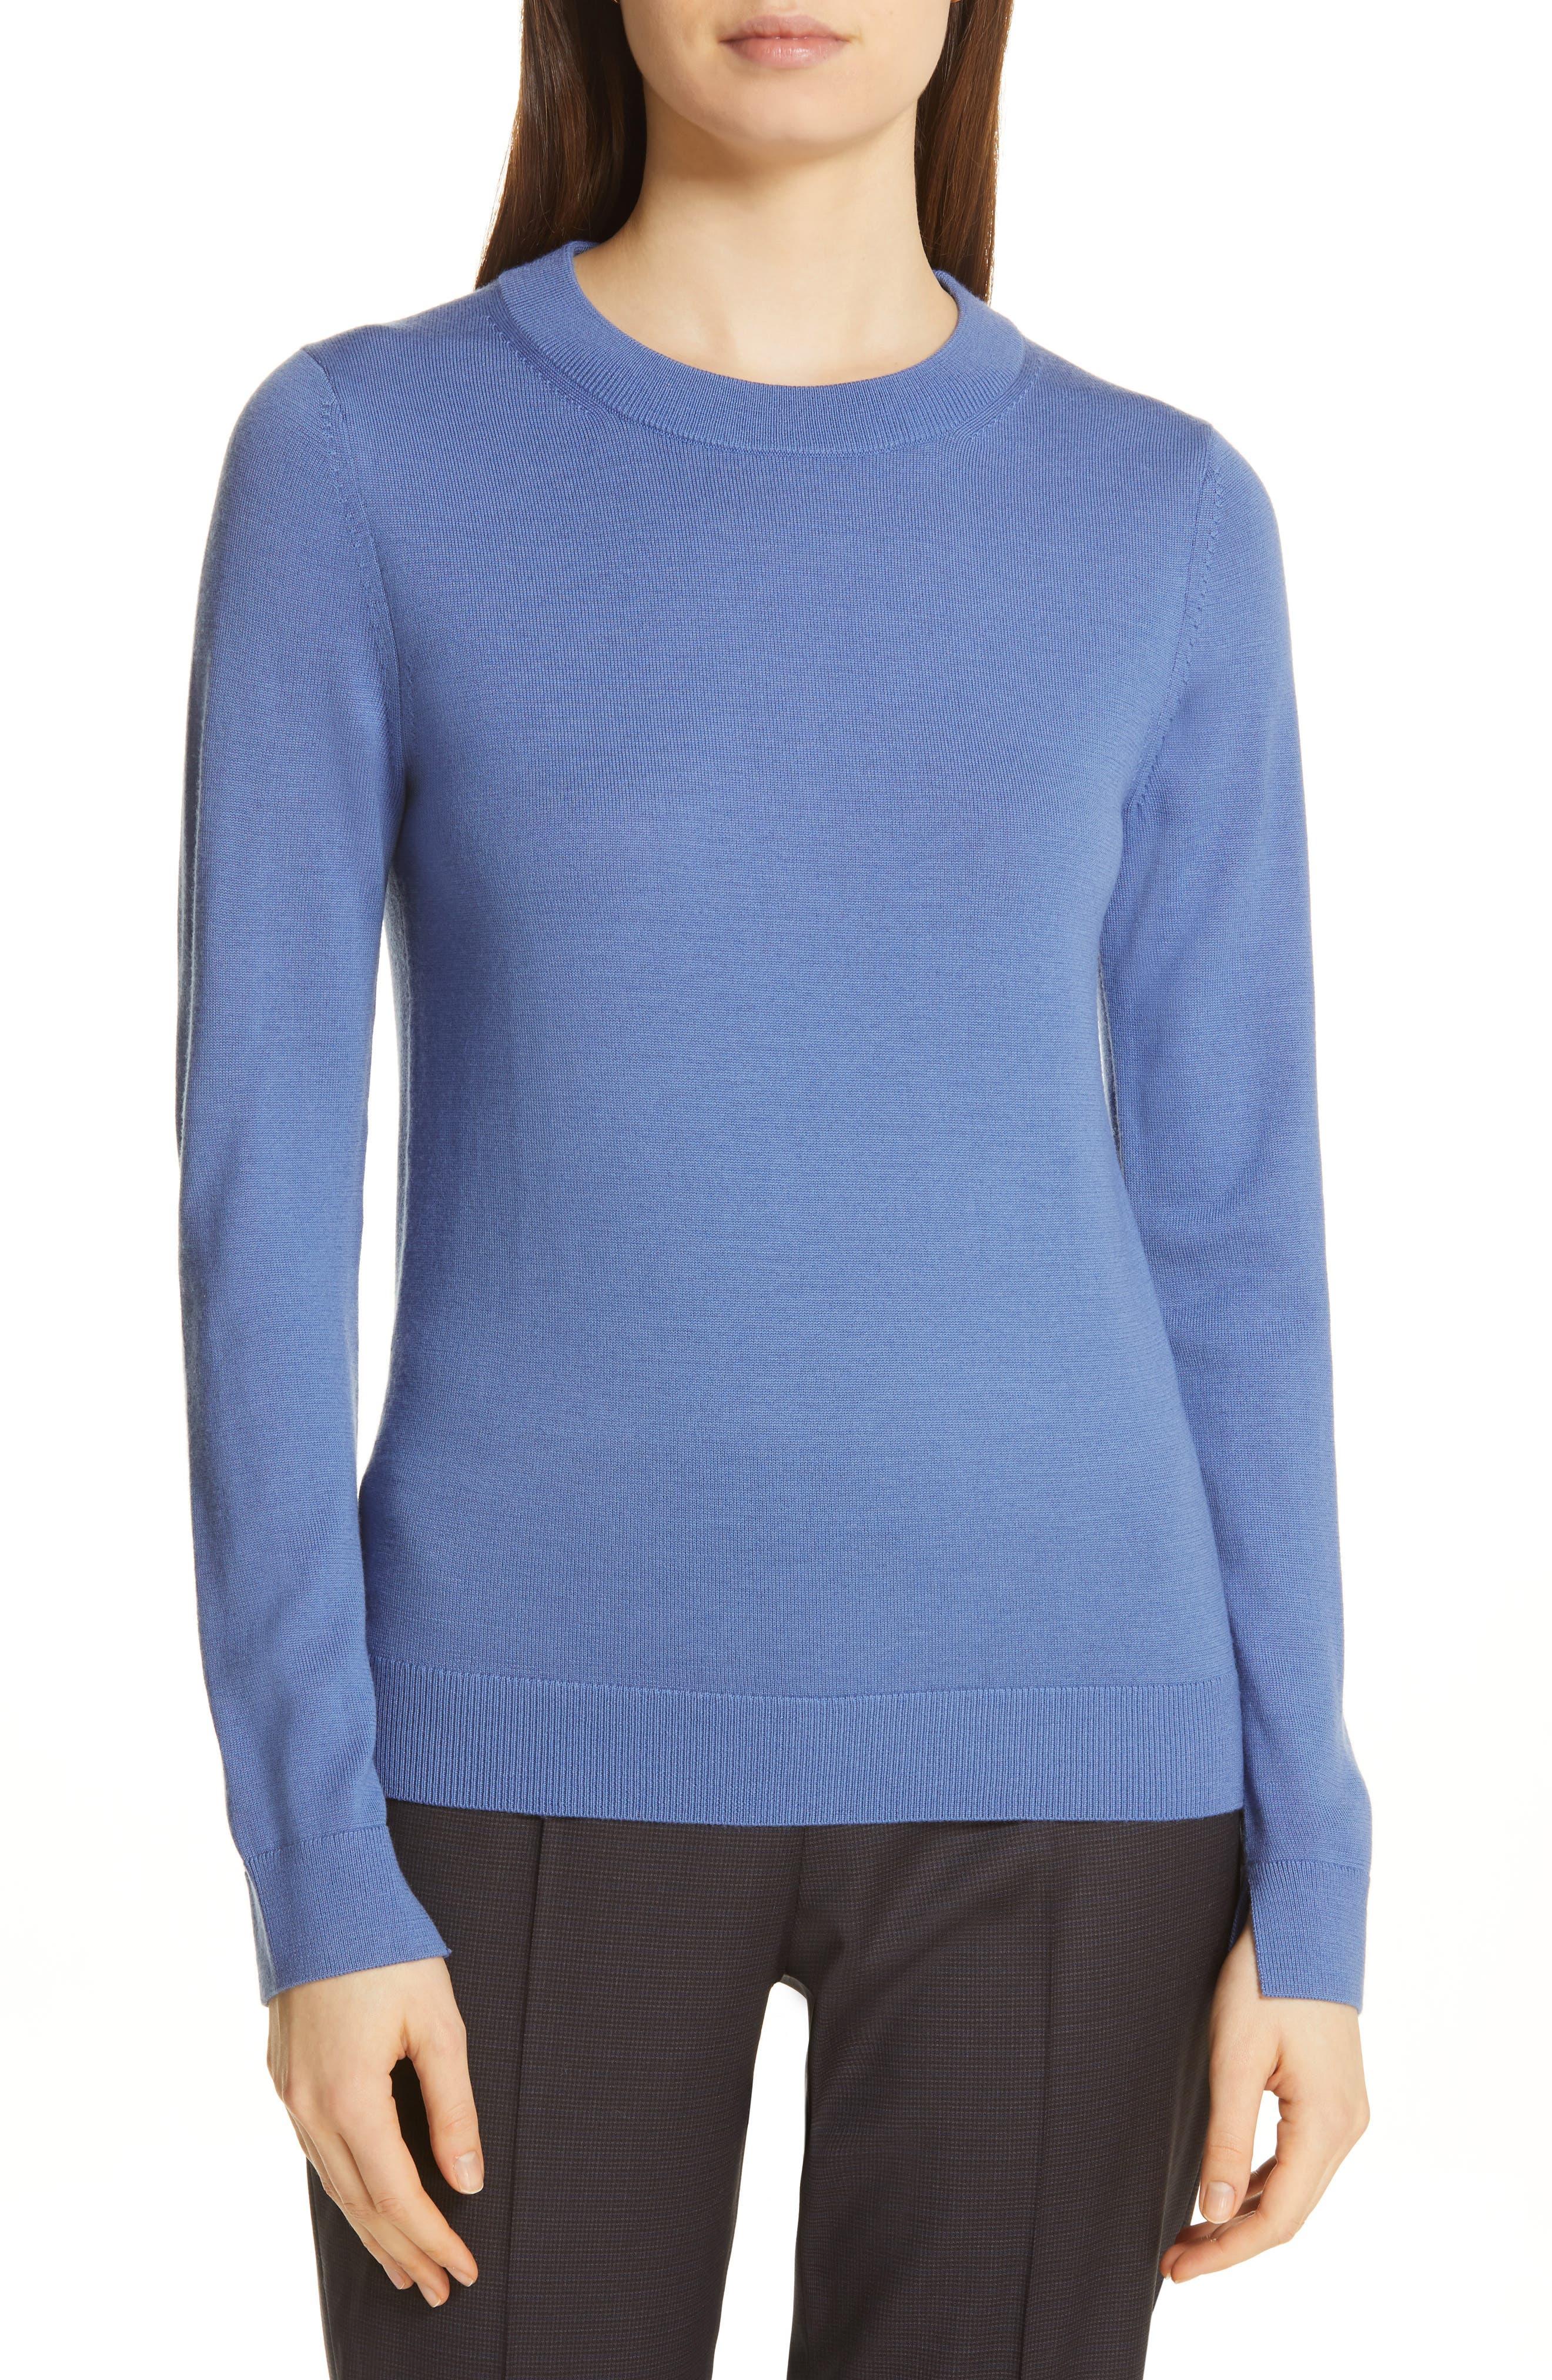 Boss Fegan Merino Wool Knit Sweater, Blue